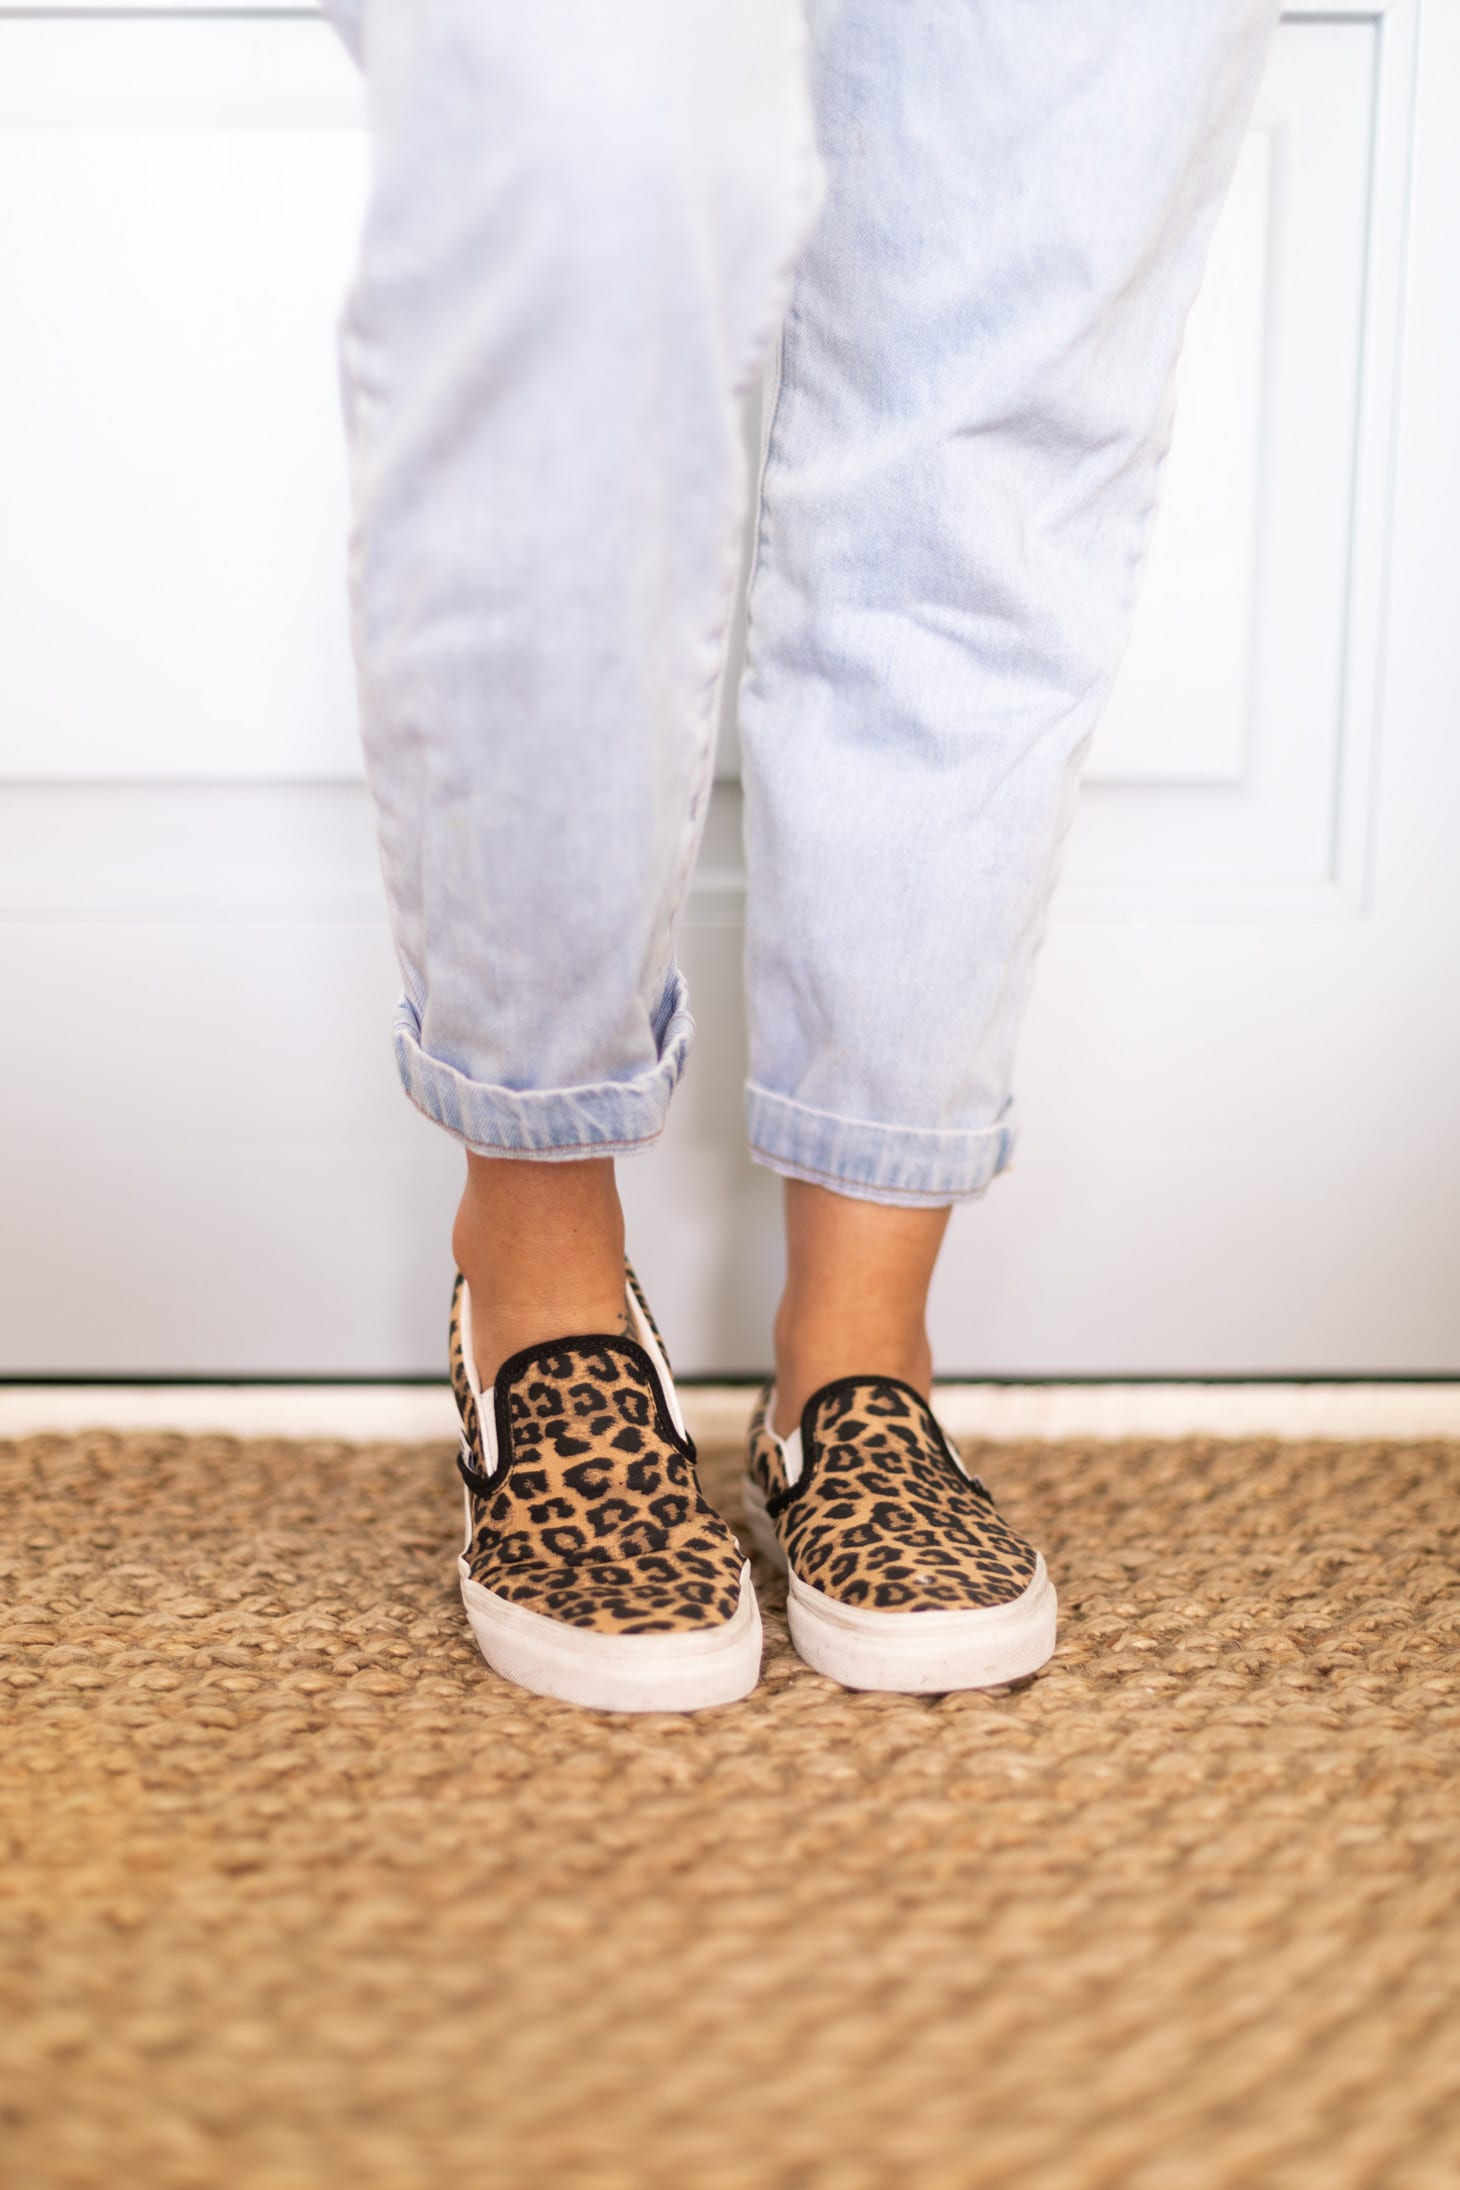 Jillian Harris Summer Shoes